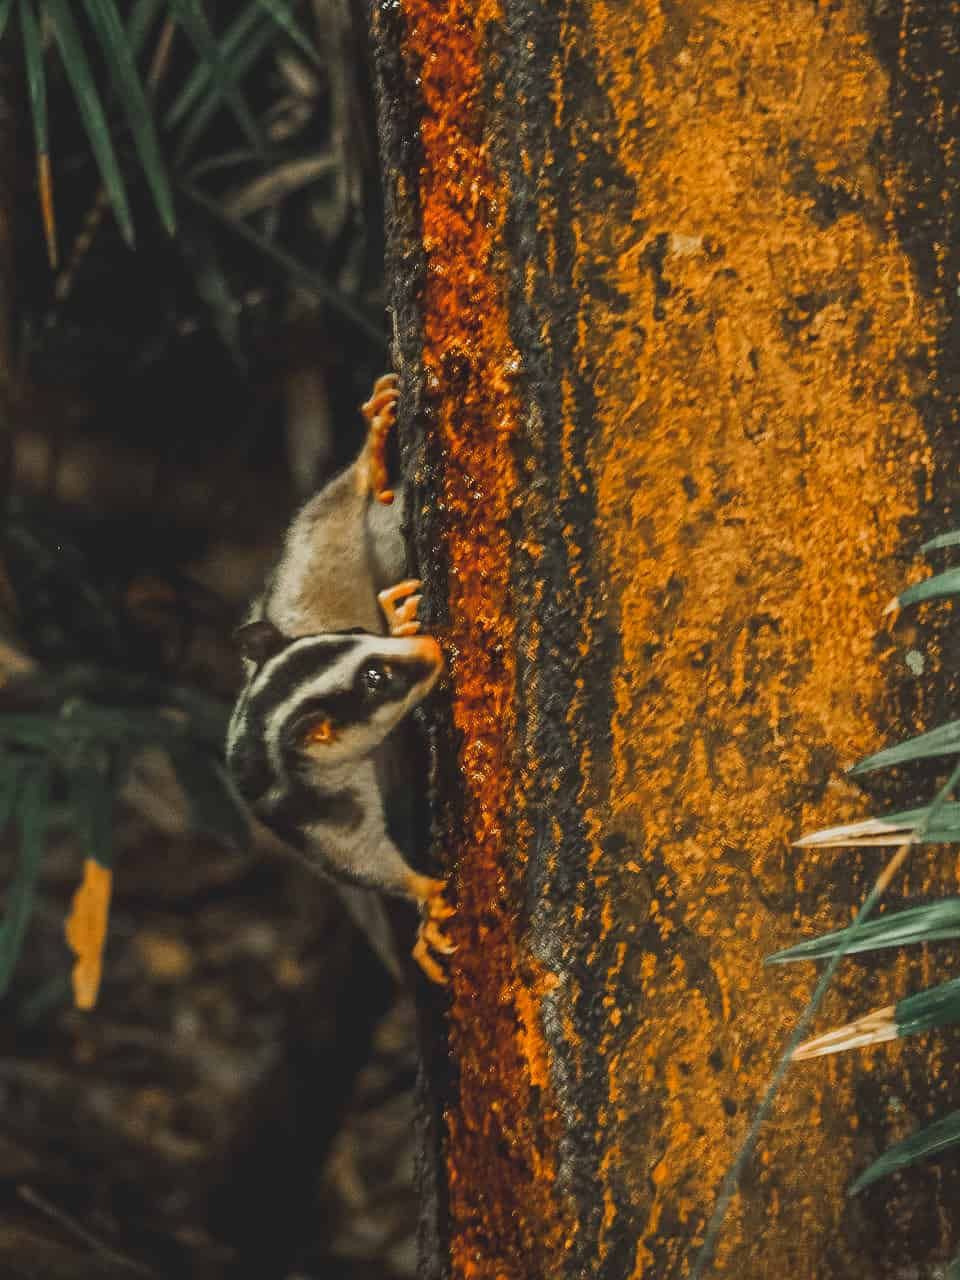 striped-possum-Chambers-Wildlife-Lodge-Atherton-Tablelands-North-Queensland-Australia ] Travel Mermaid 035